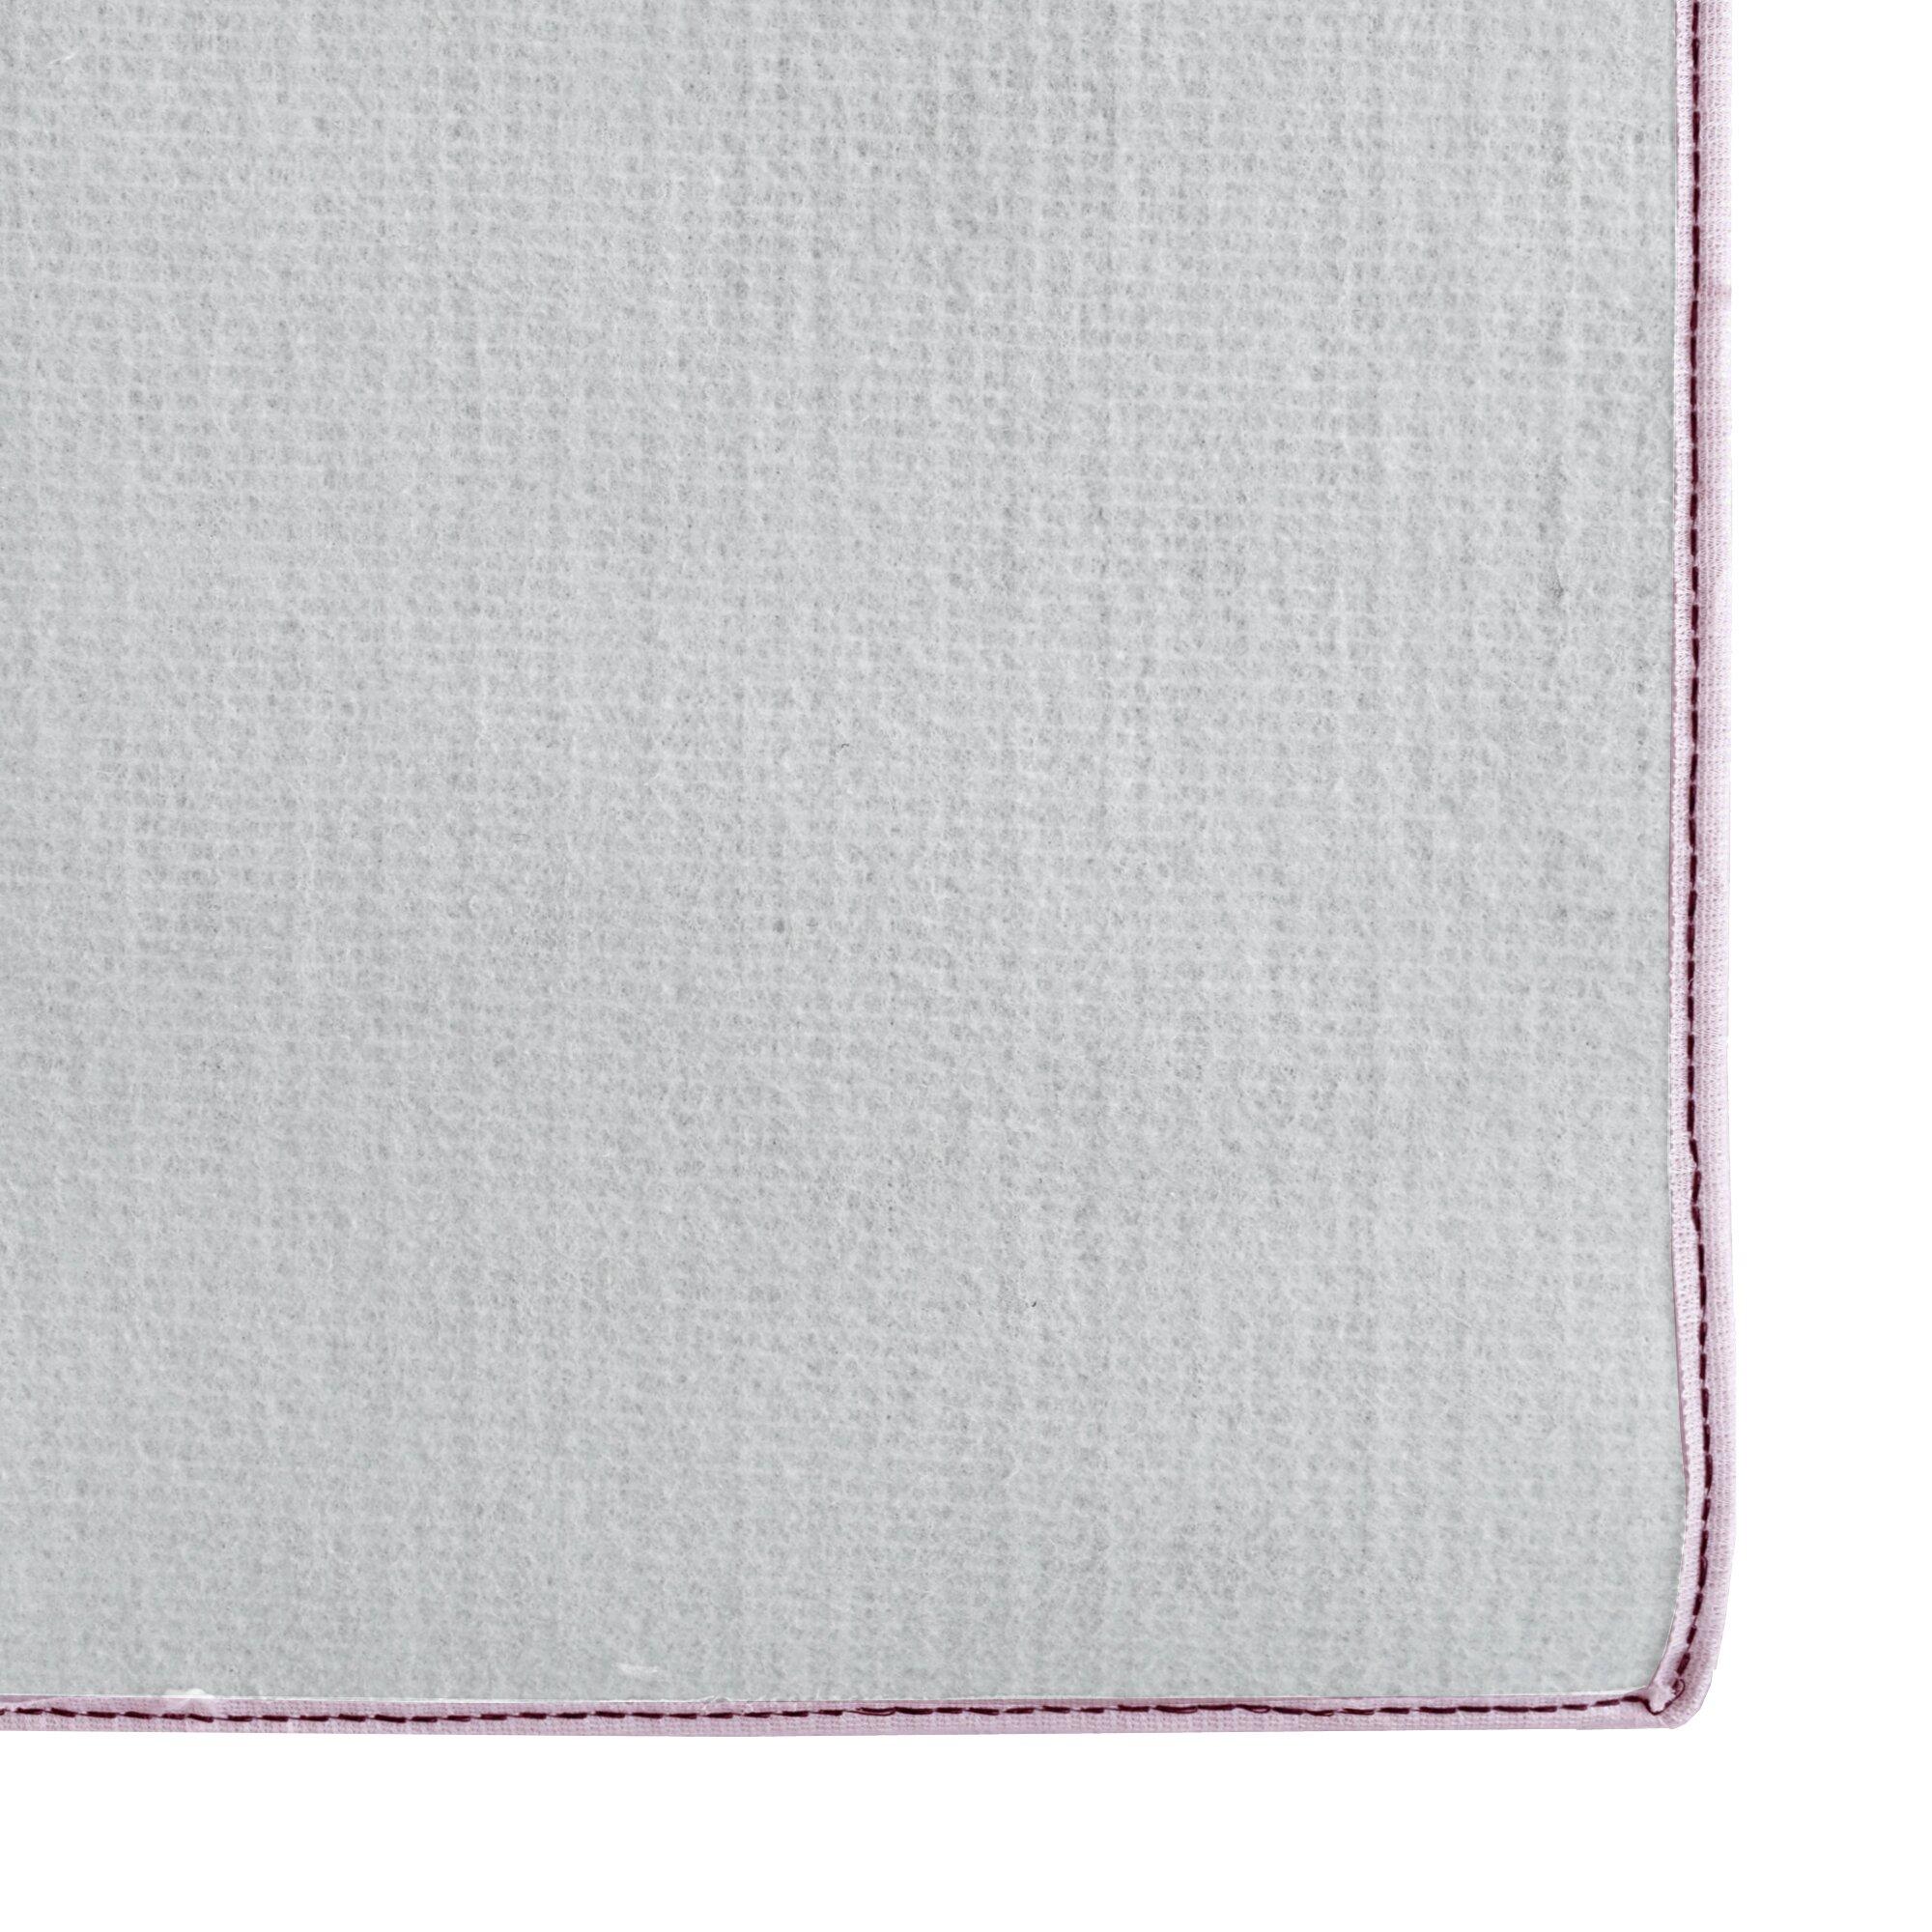 Rug Studio Modern Pink Blush Shag Area Rug & Reviews